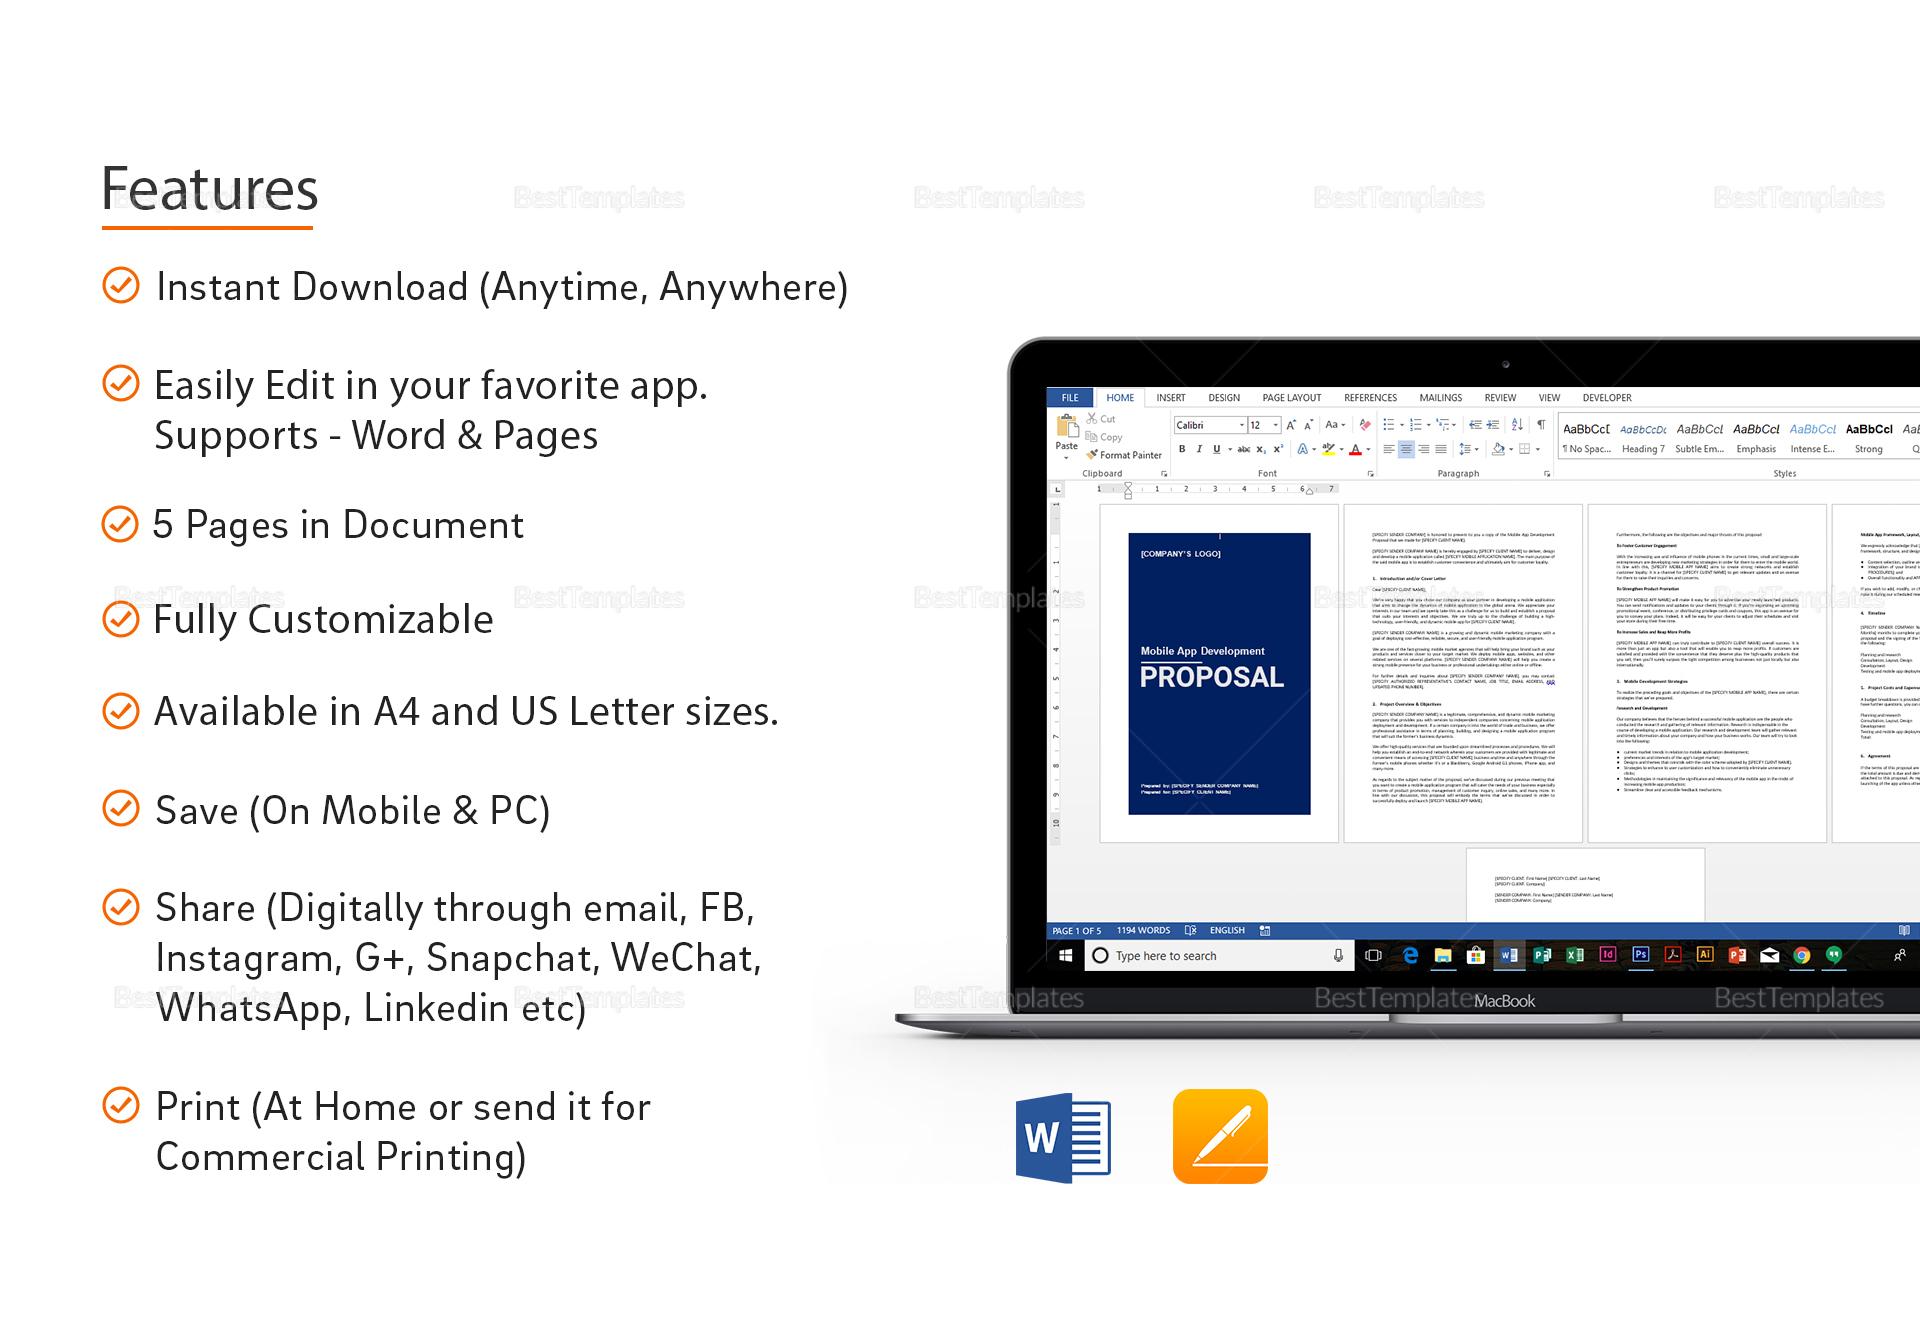 mobile app development proposal template in word google docs apple